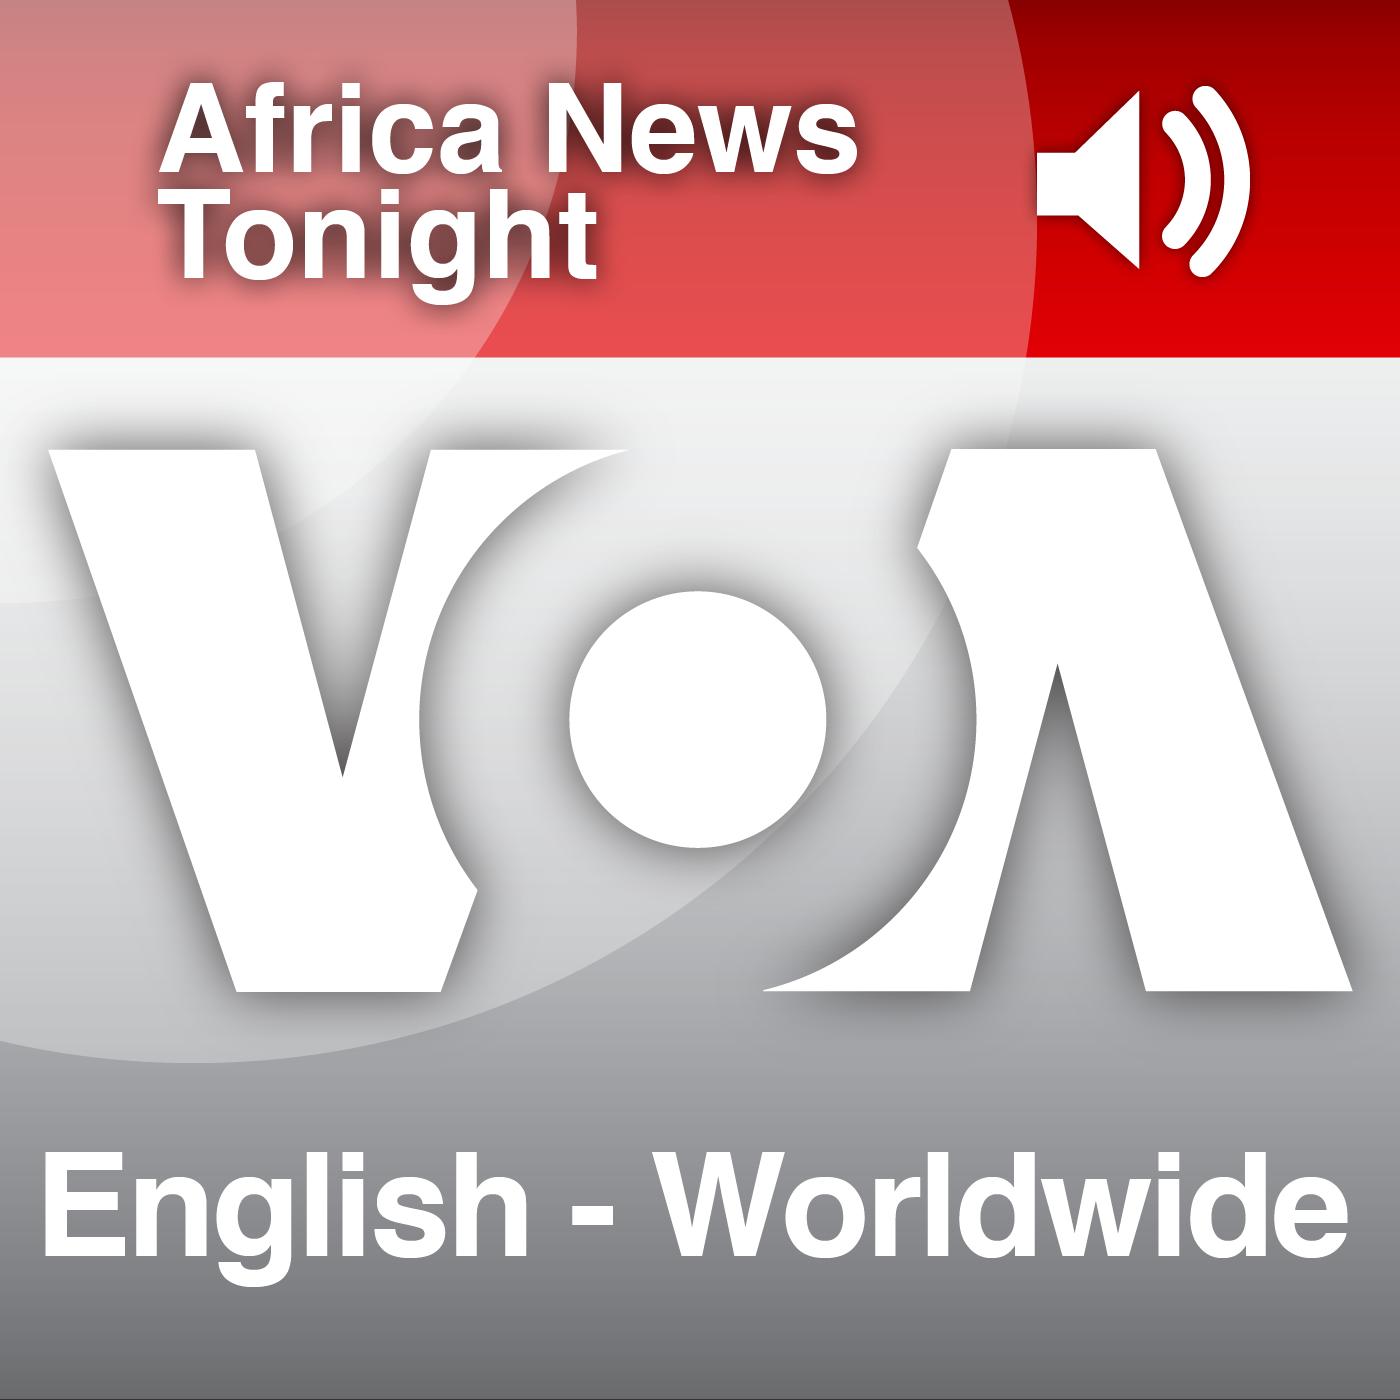 Africa News Tonight  - Voice of America